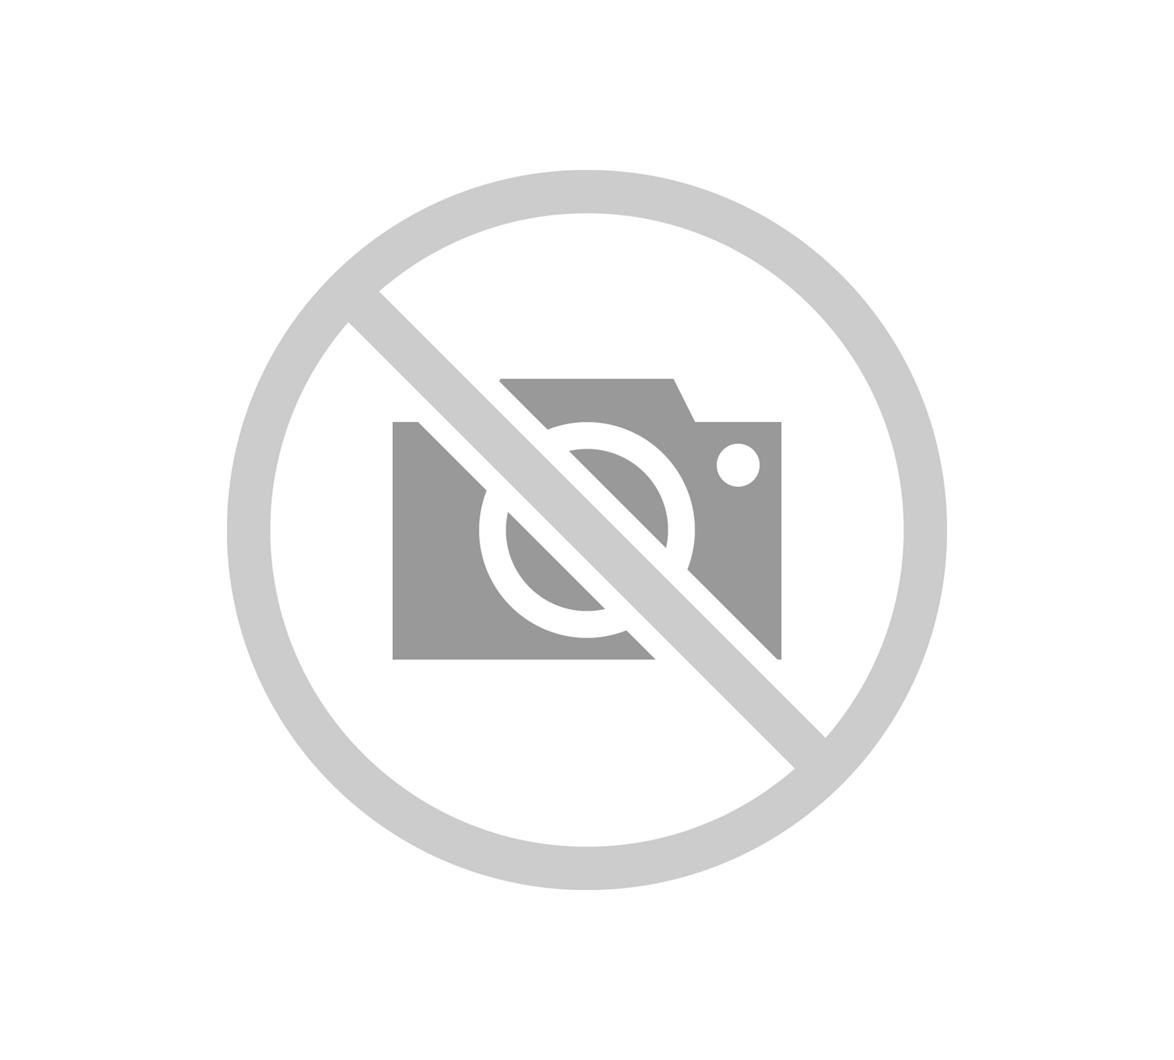 Křeslo BALBOA Malmo 96 tmavě šedá